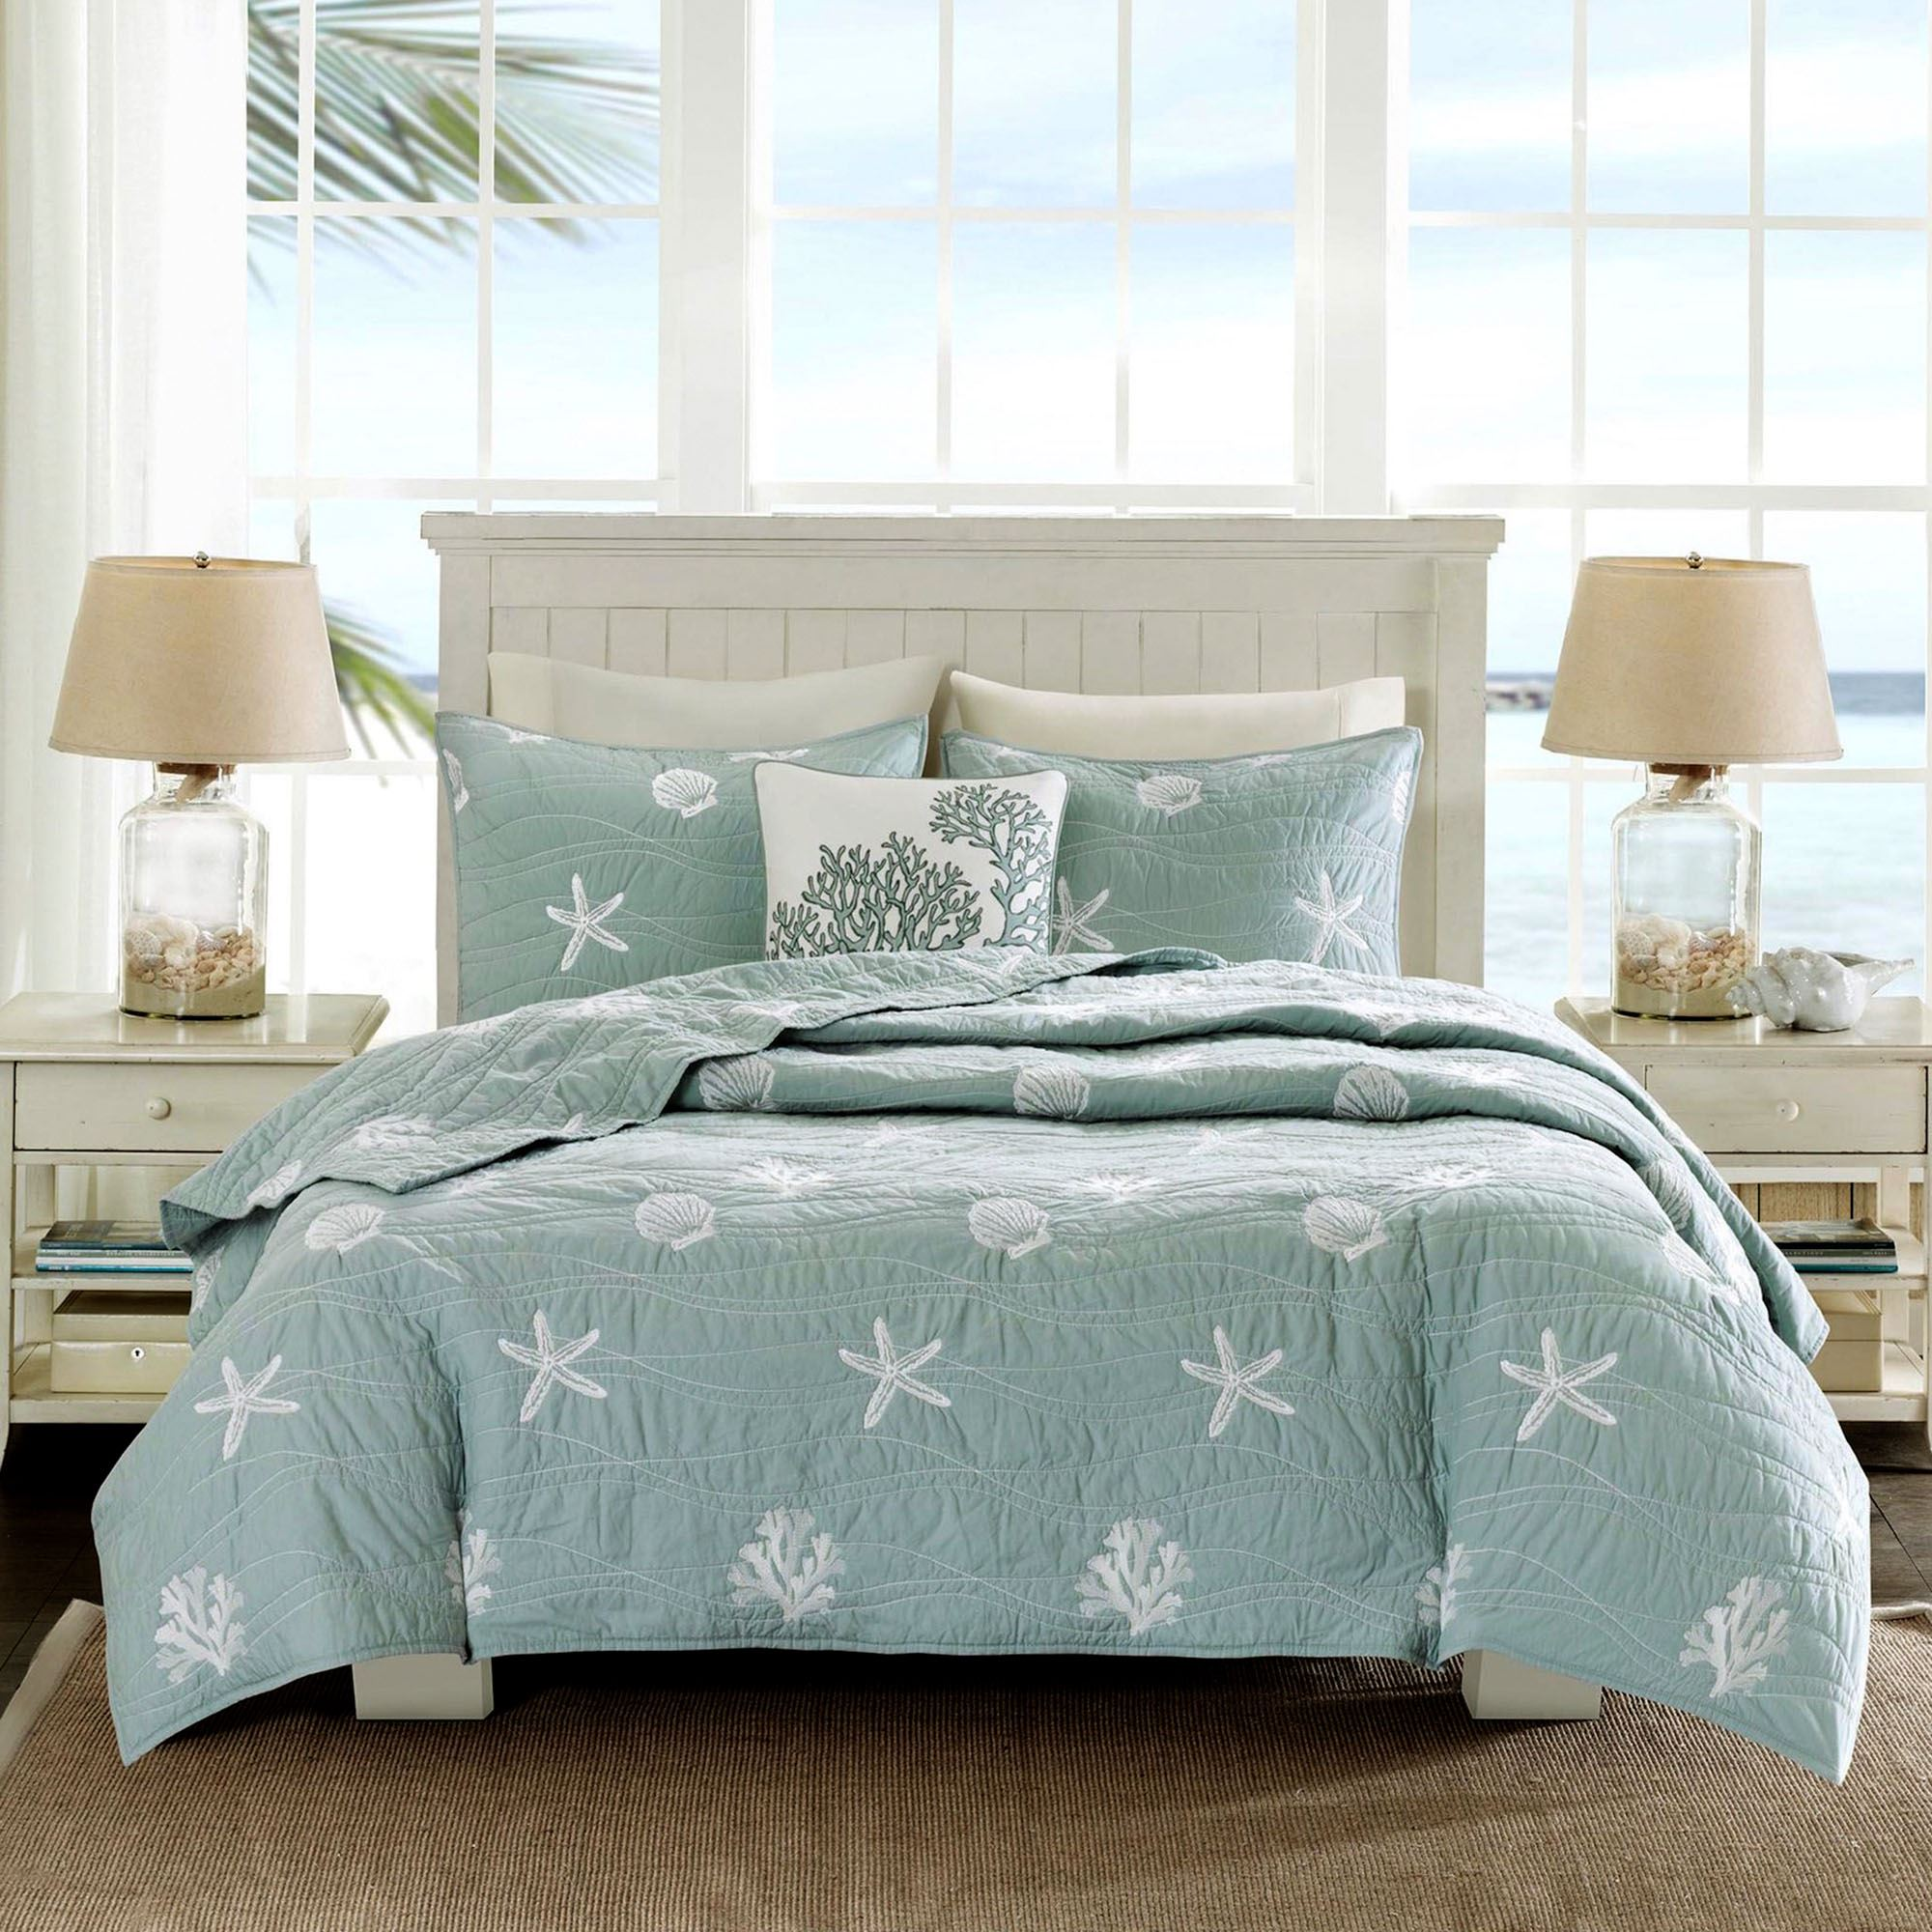 seaside 4 pc coastal coverlet bed set